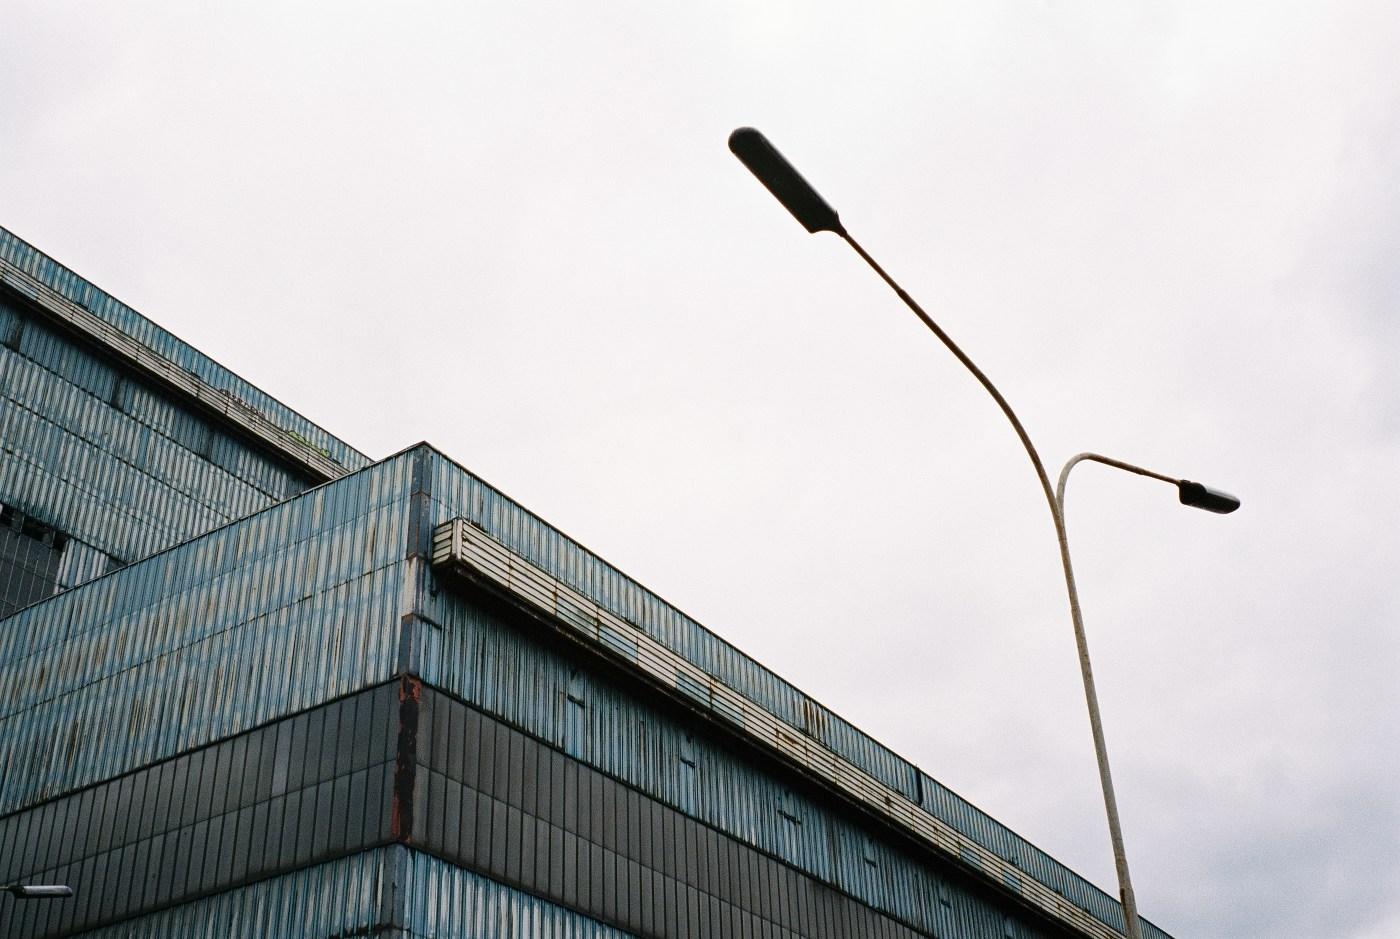 000027JoergBergs-KodakPortra400-MeinFilmLab-M7-35